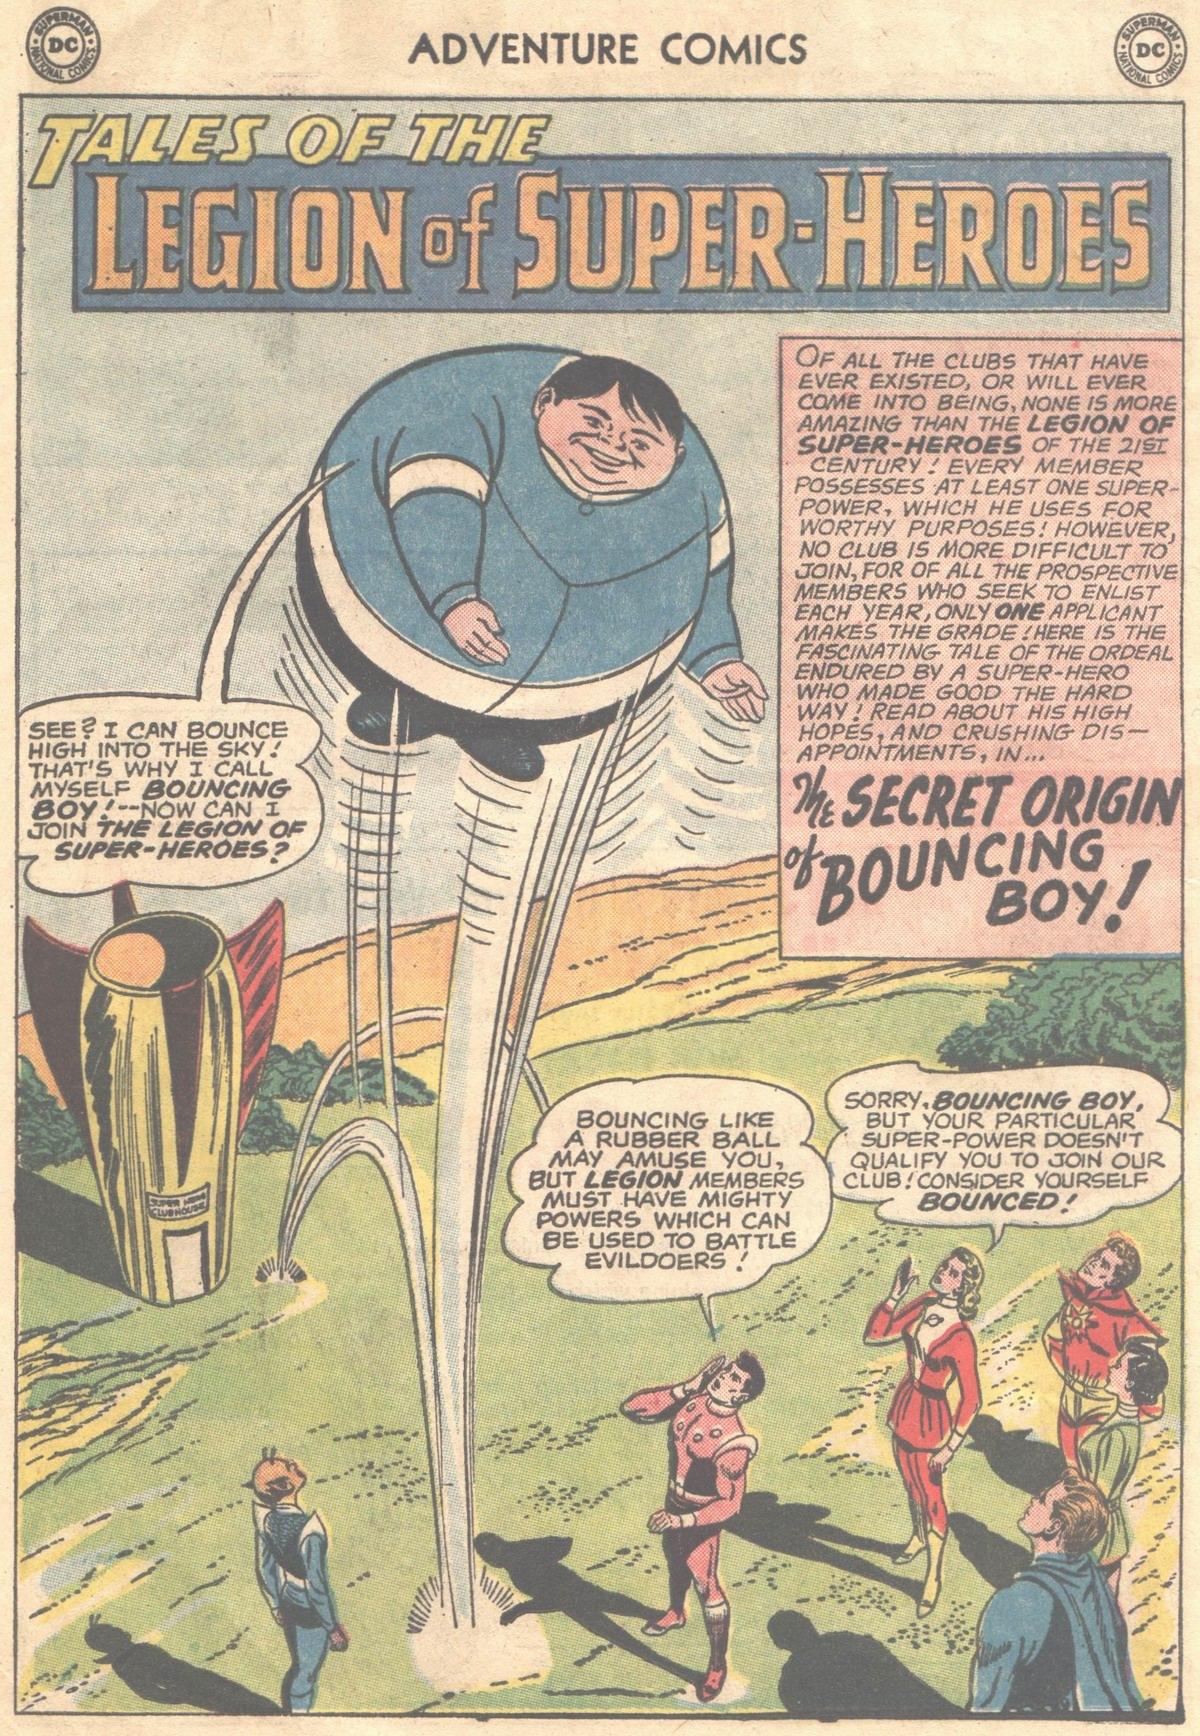 Read online Adventure Comics (1938) comic -  Issue #498 - 12